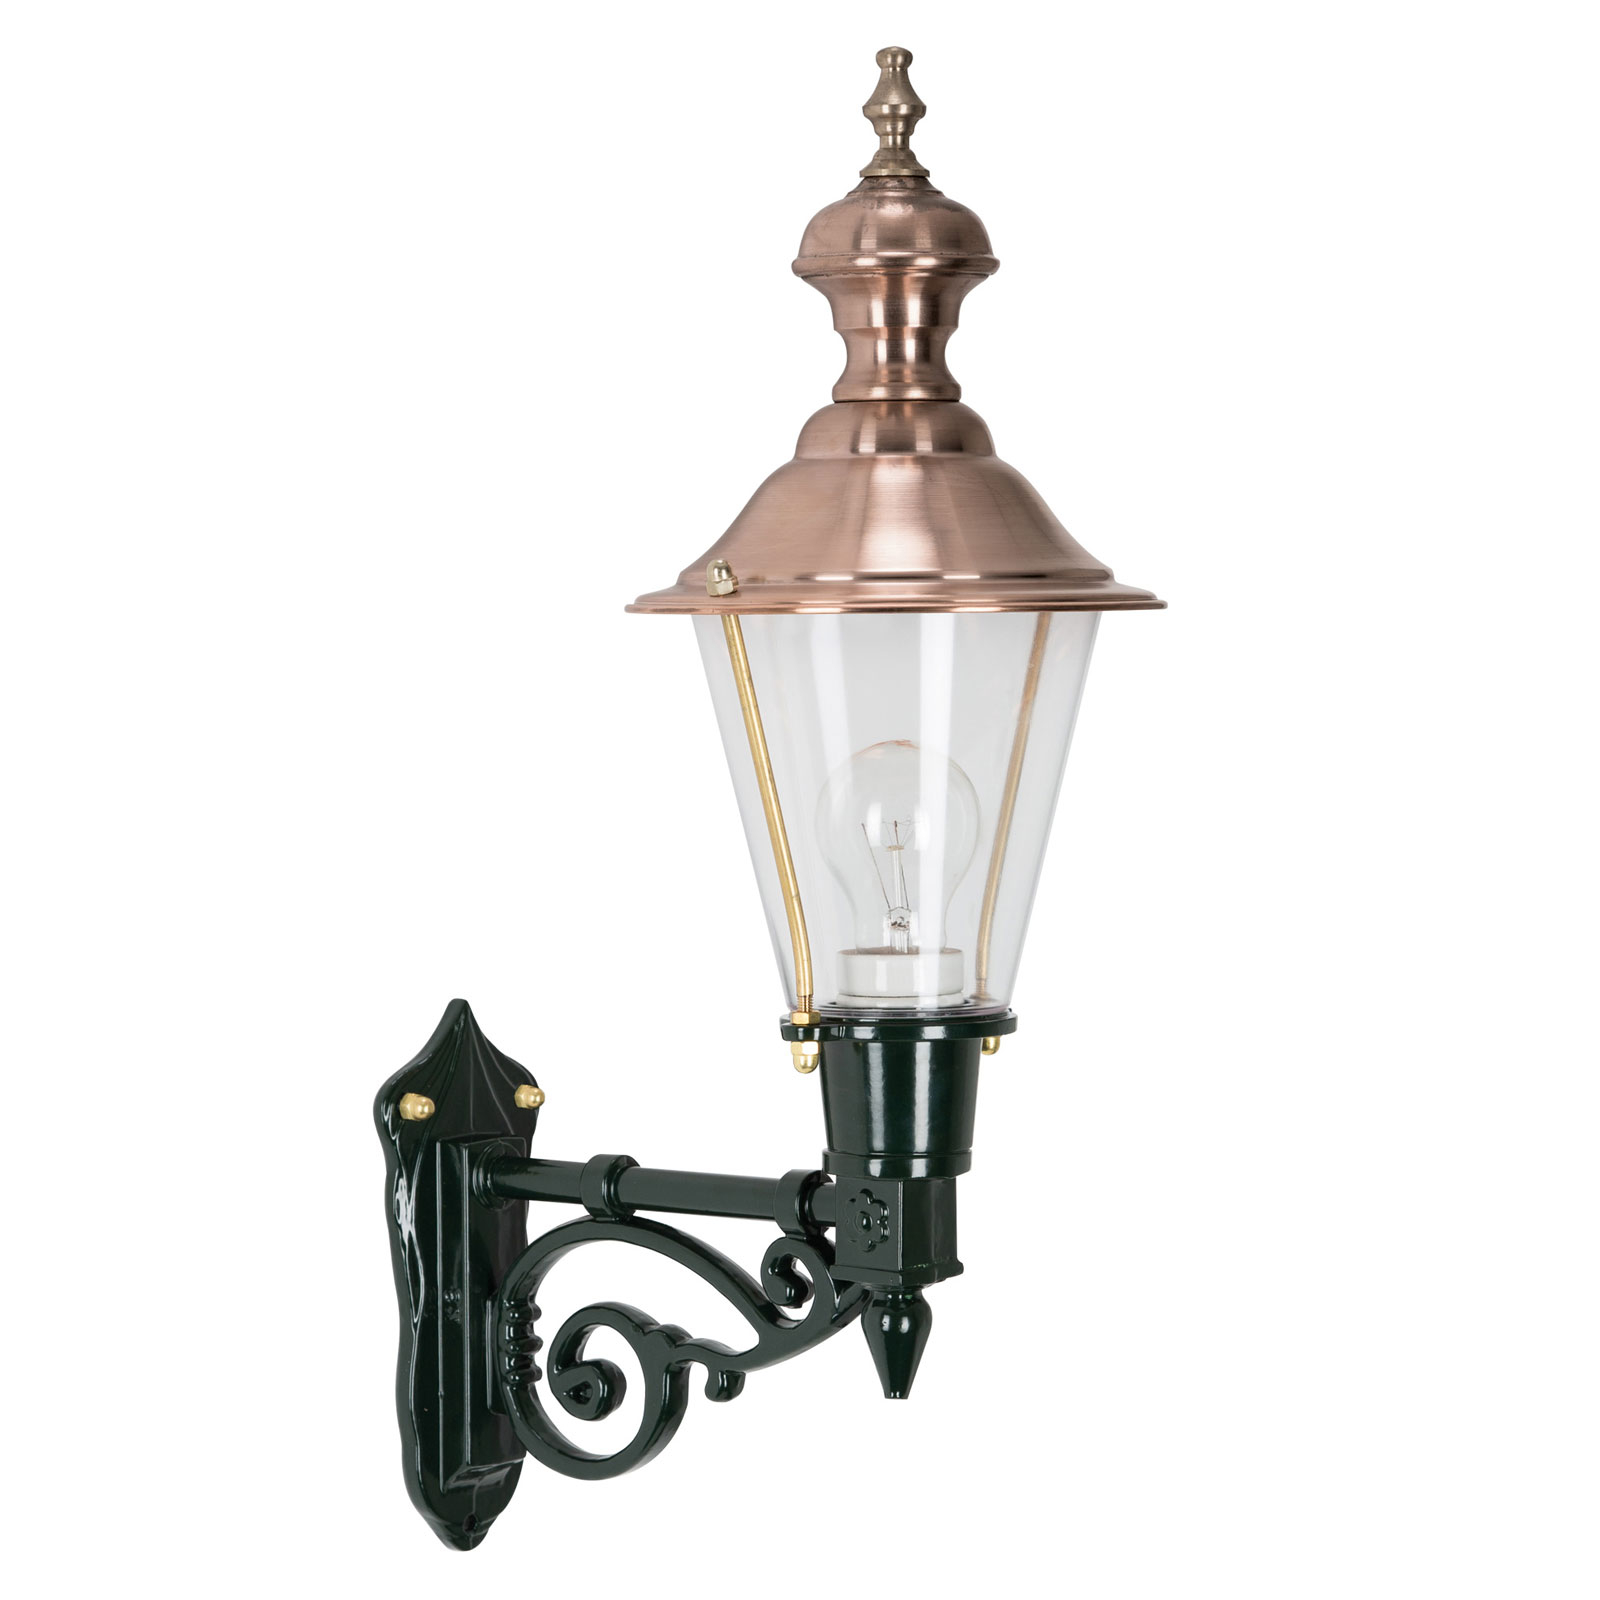 Nostalgische buitenwandlamp Edam M, groen/koper